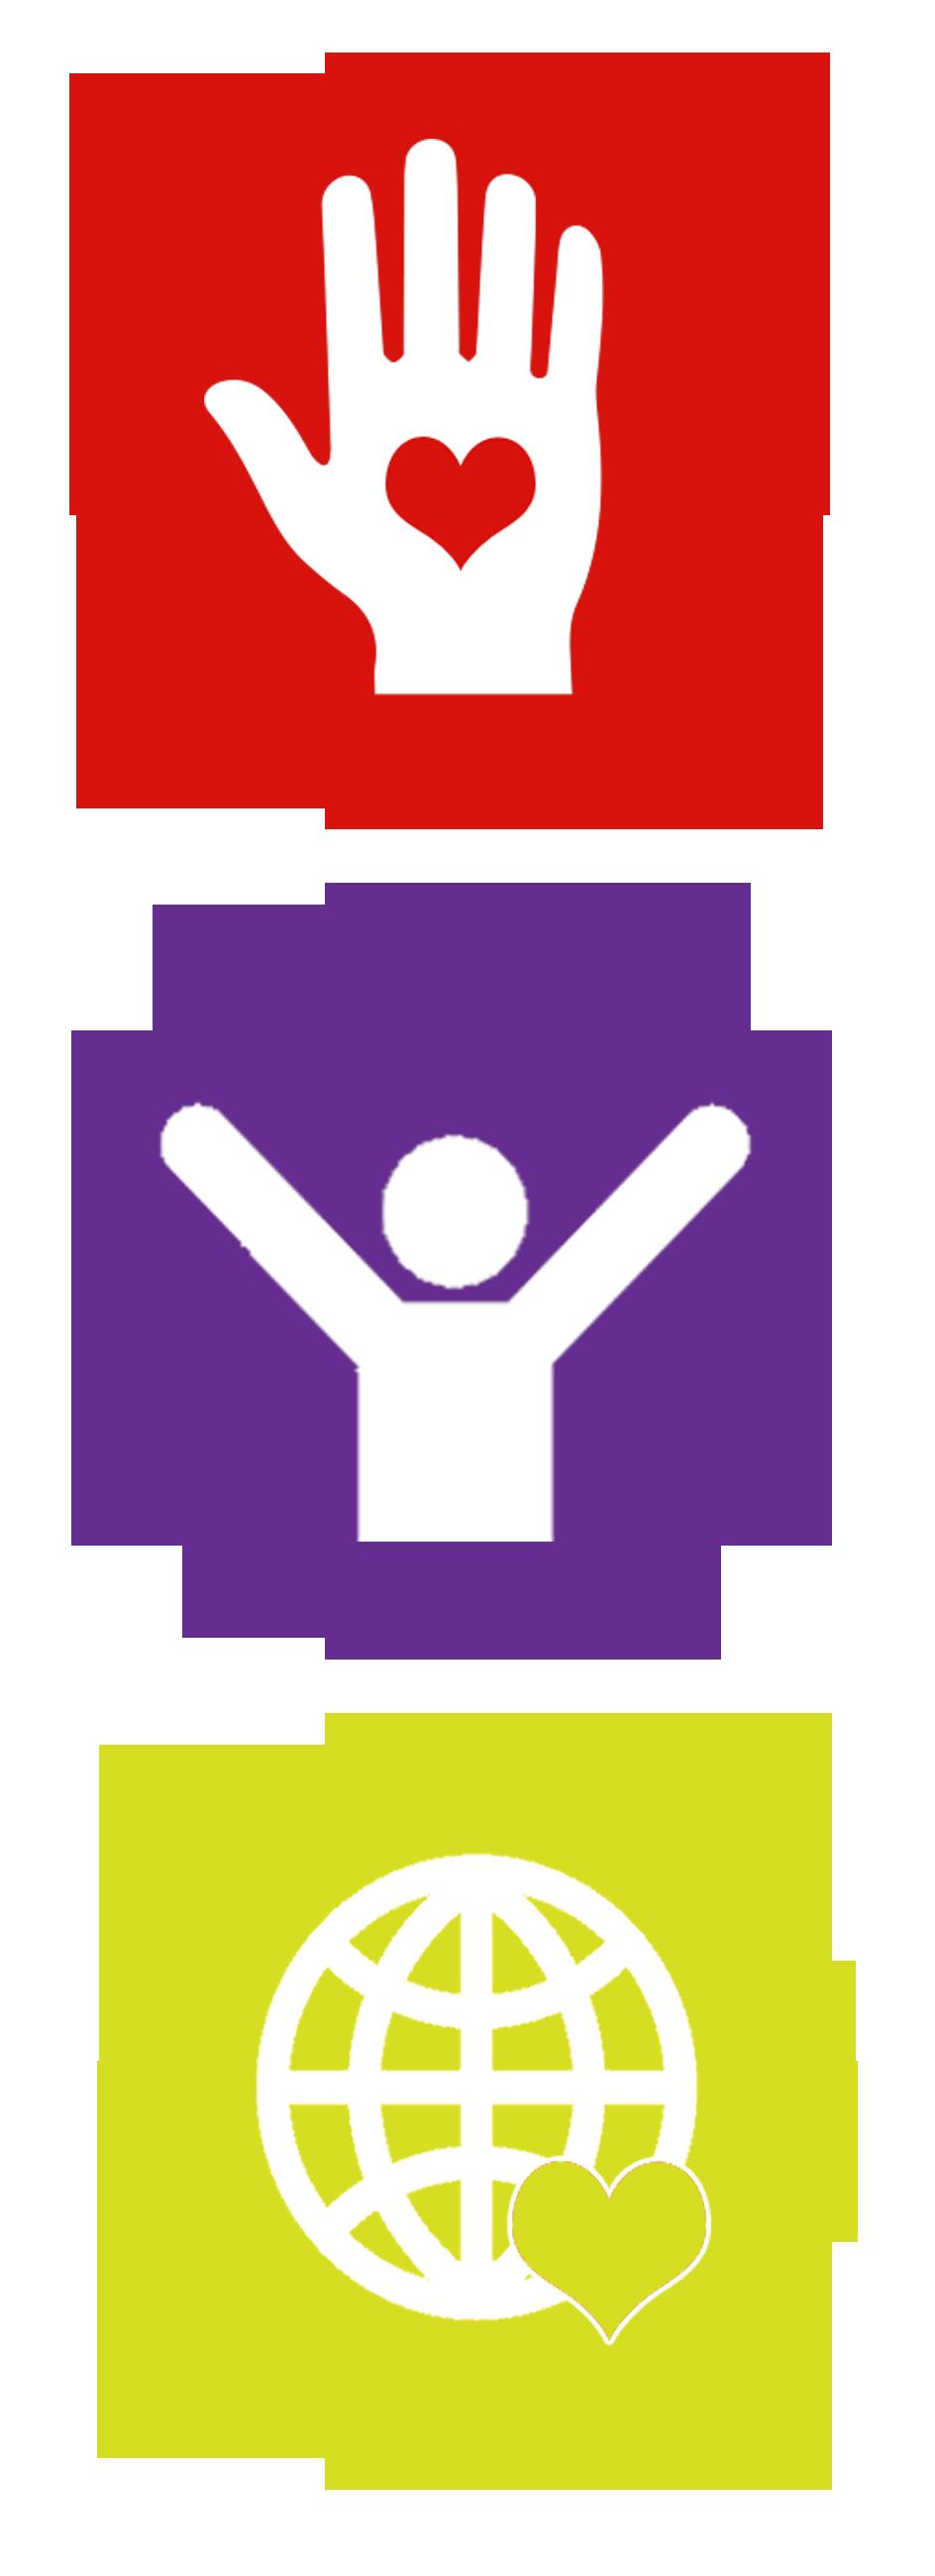 The program globestrong according. Volunteering clipart solidarity